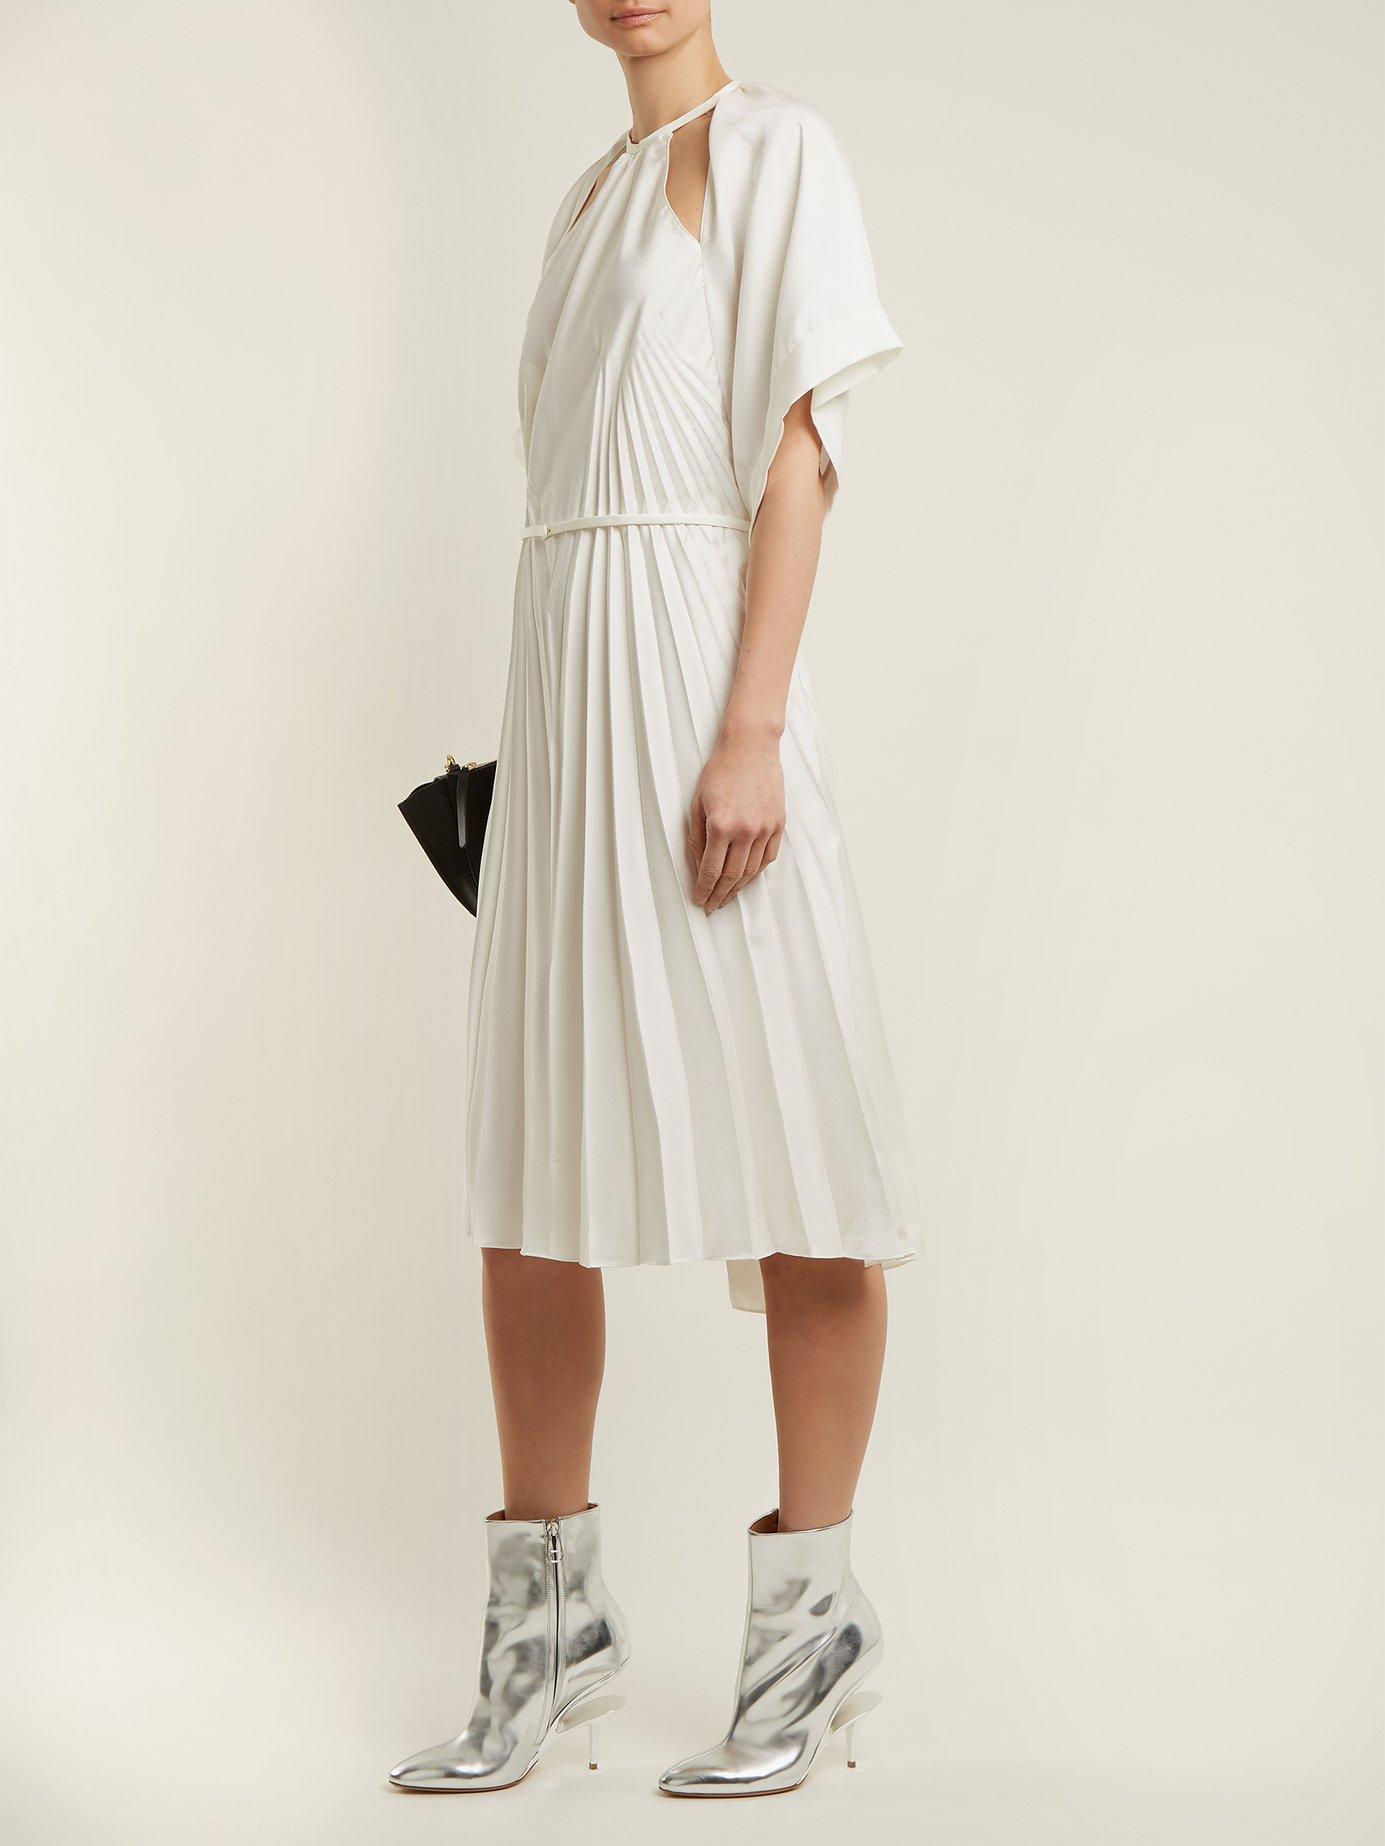 Pleated cut-out satin dress by Maison Margiela